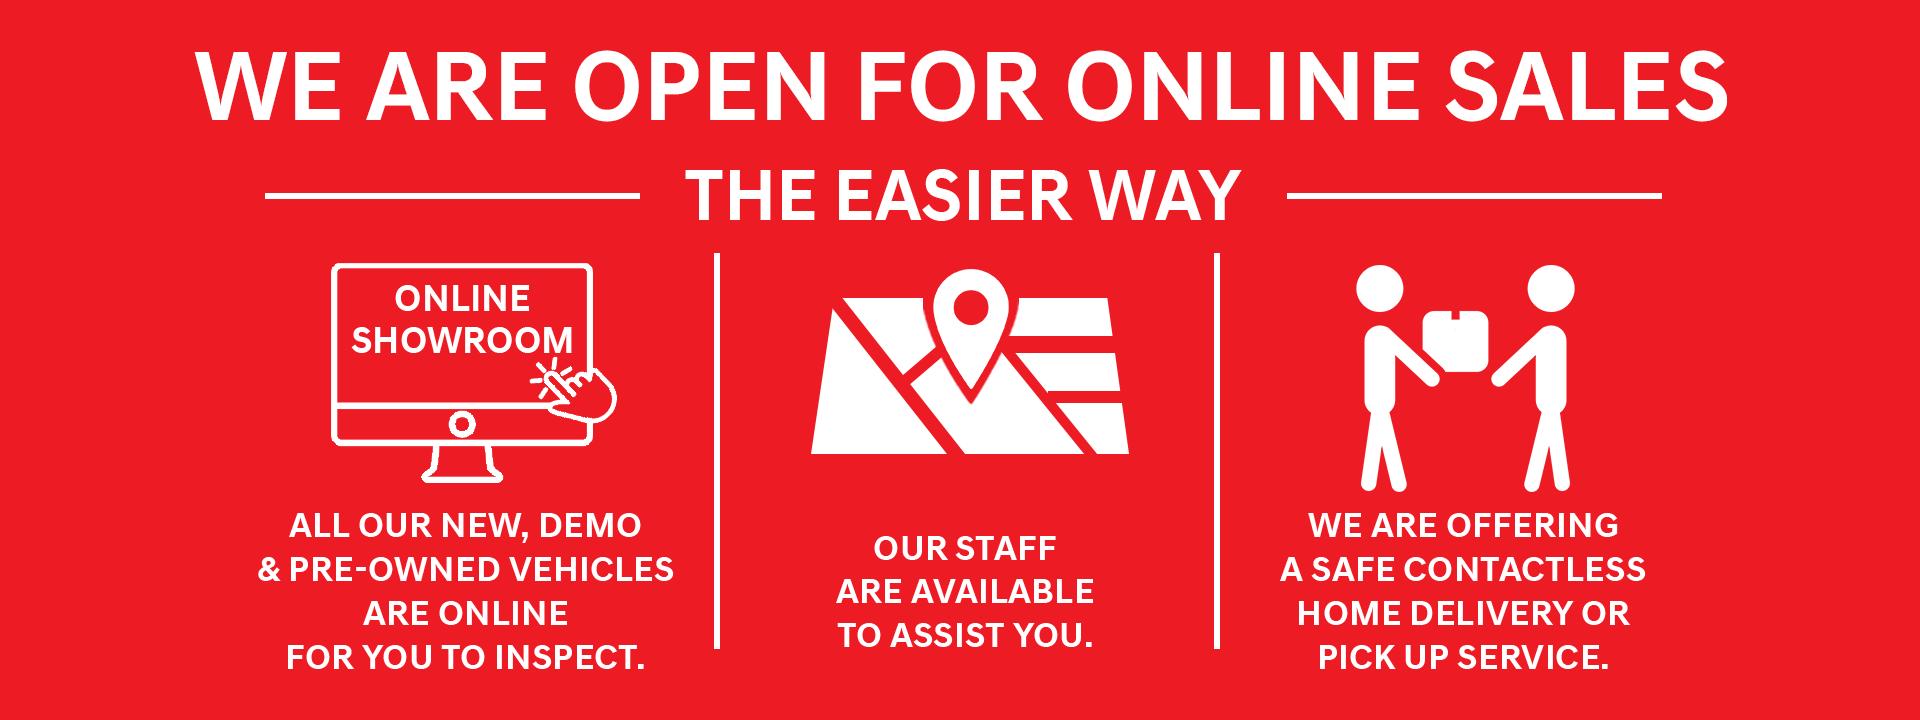 Cranbourne Hyundai - We are open online